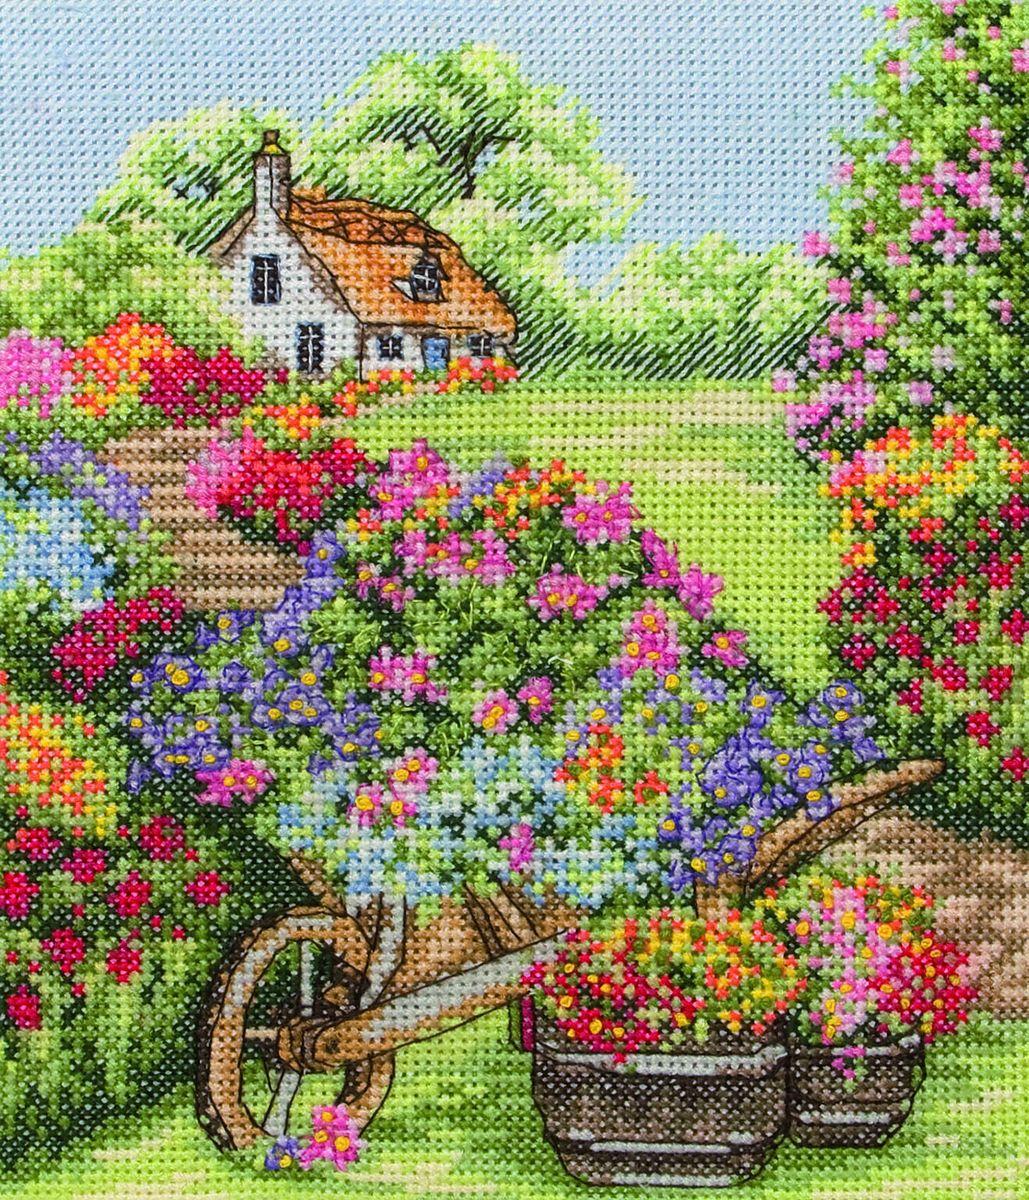 Фото вышивки с цветами 335